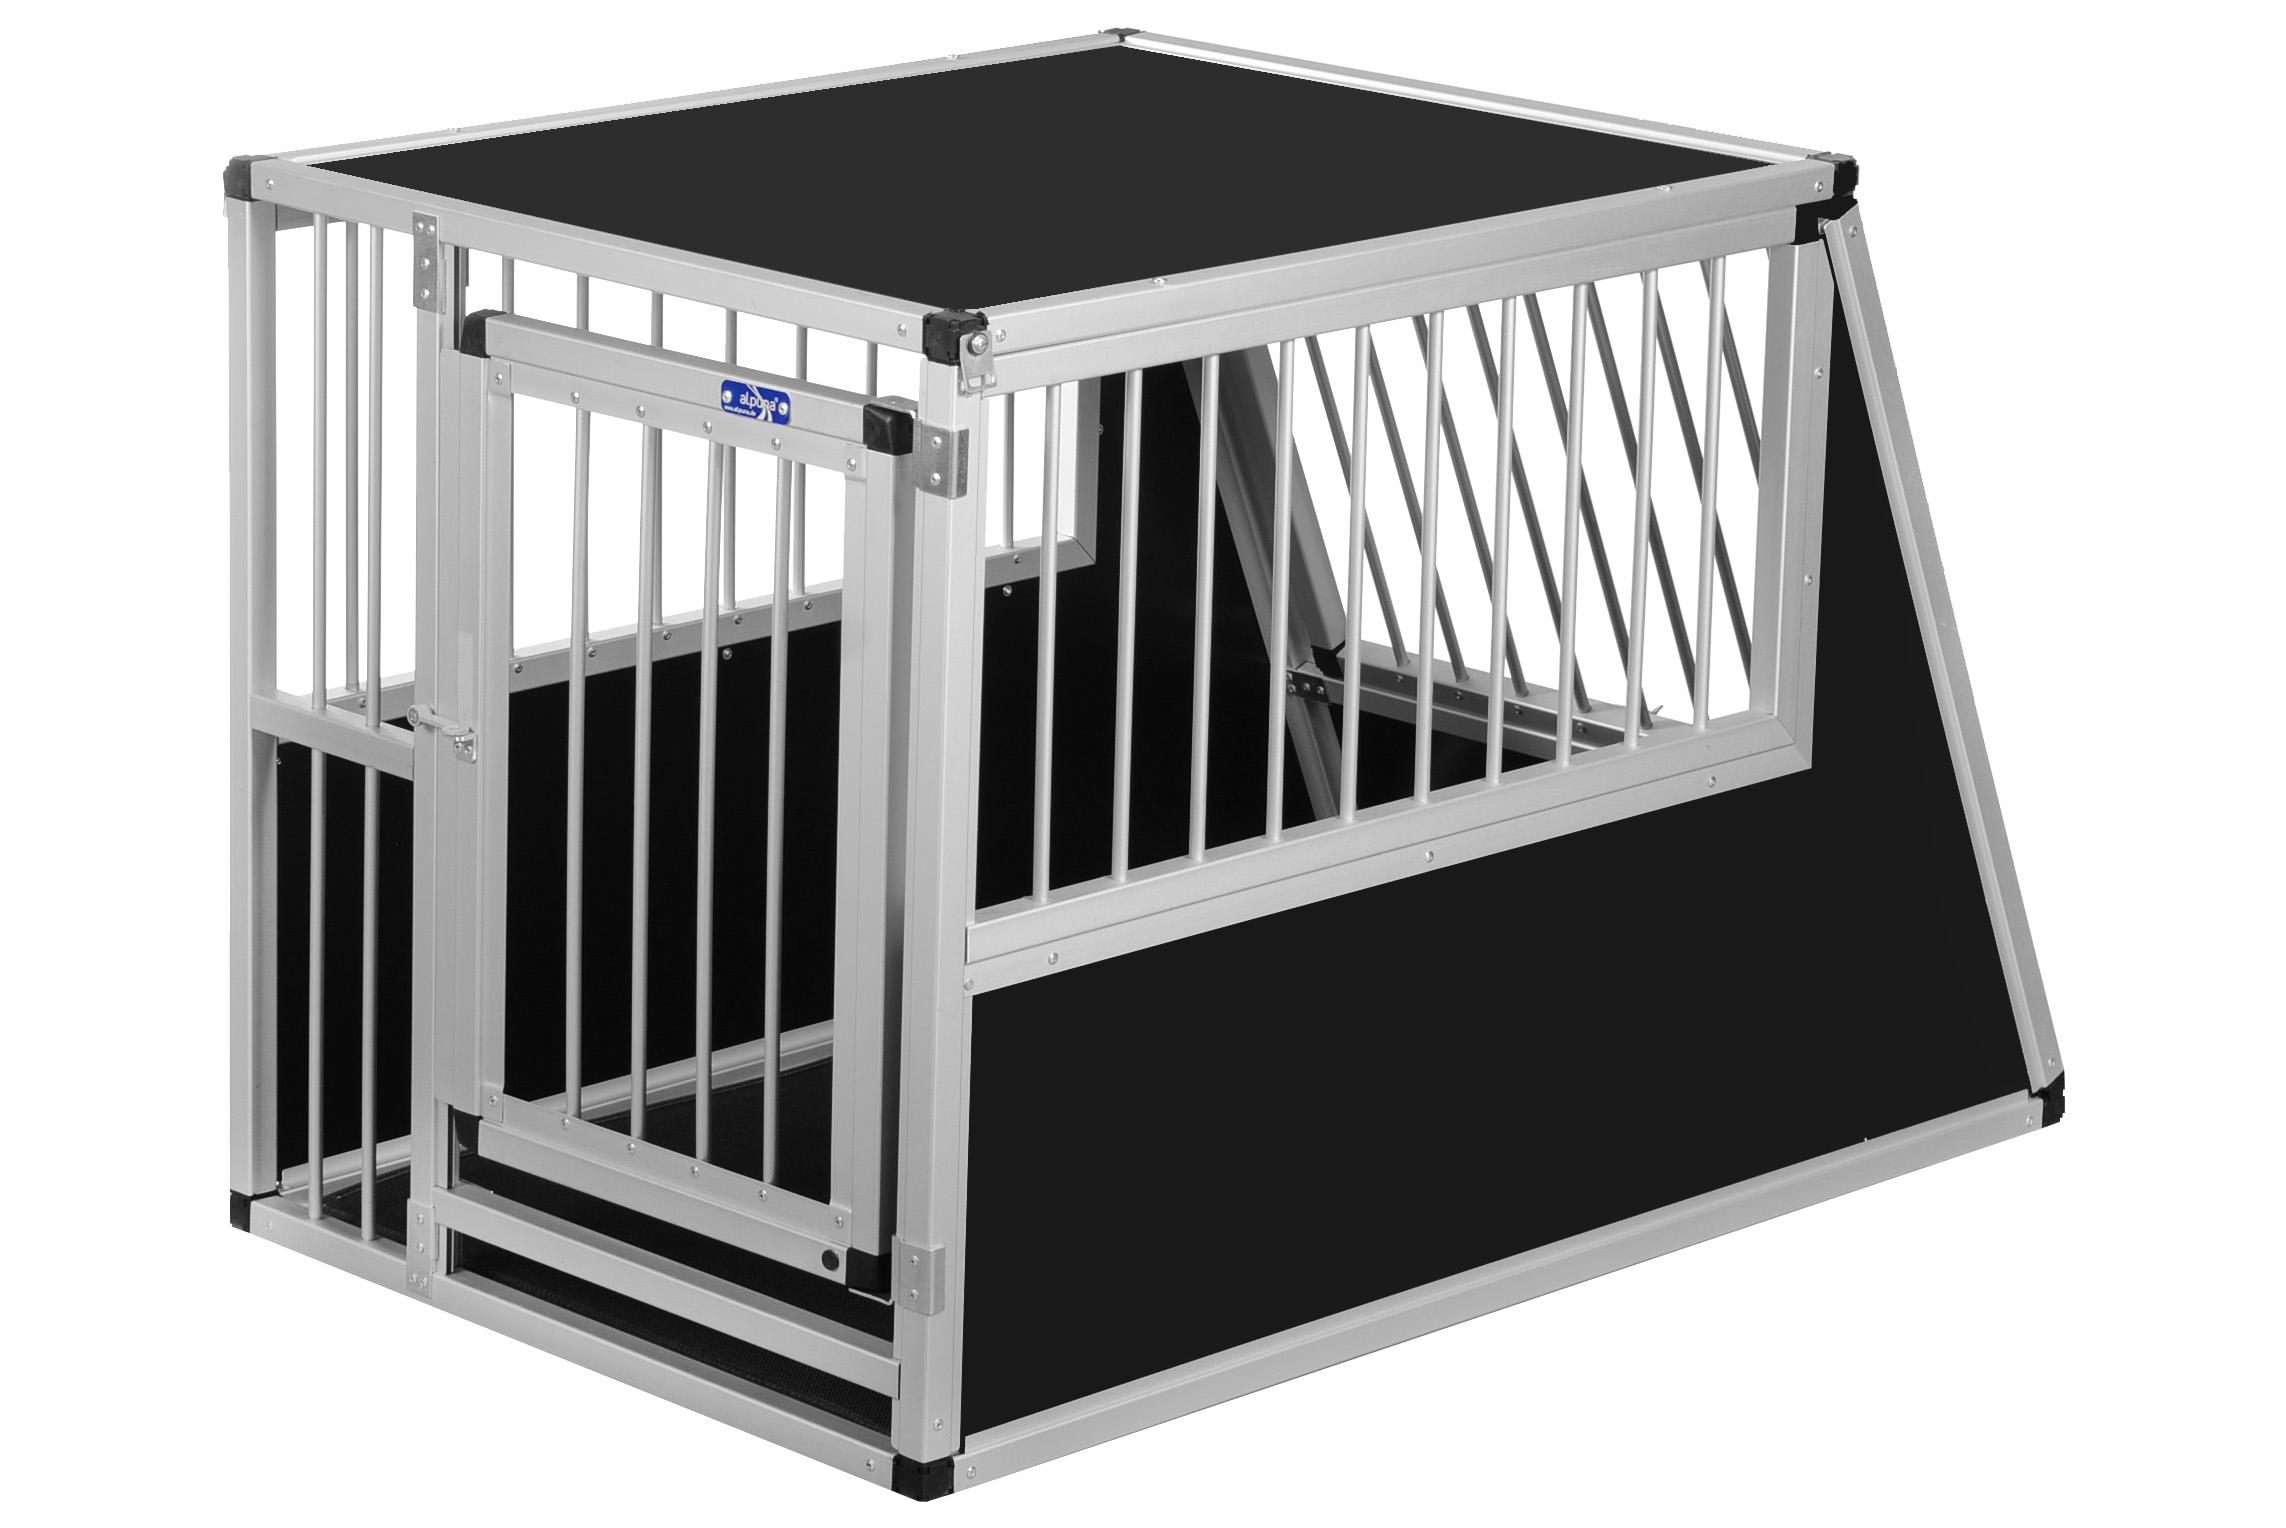 transportbox n49 115x70x75cm notausstieg alu. Black Bedroom Furniture Sets. Home Design Ideas